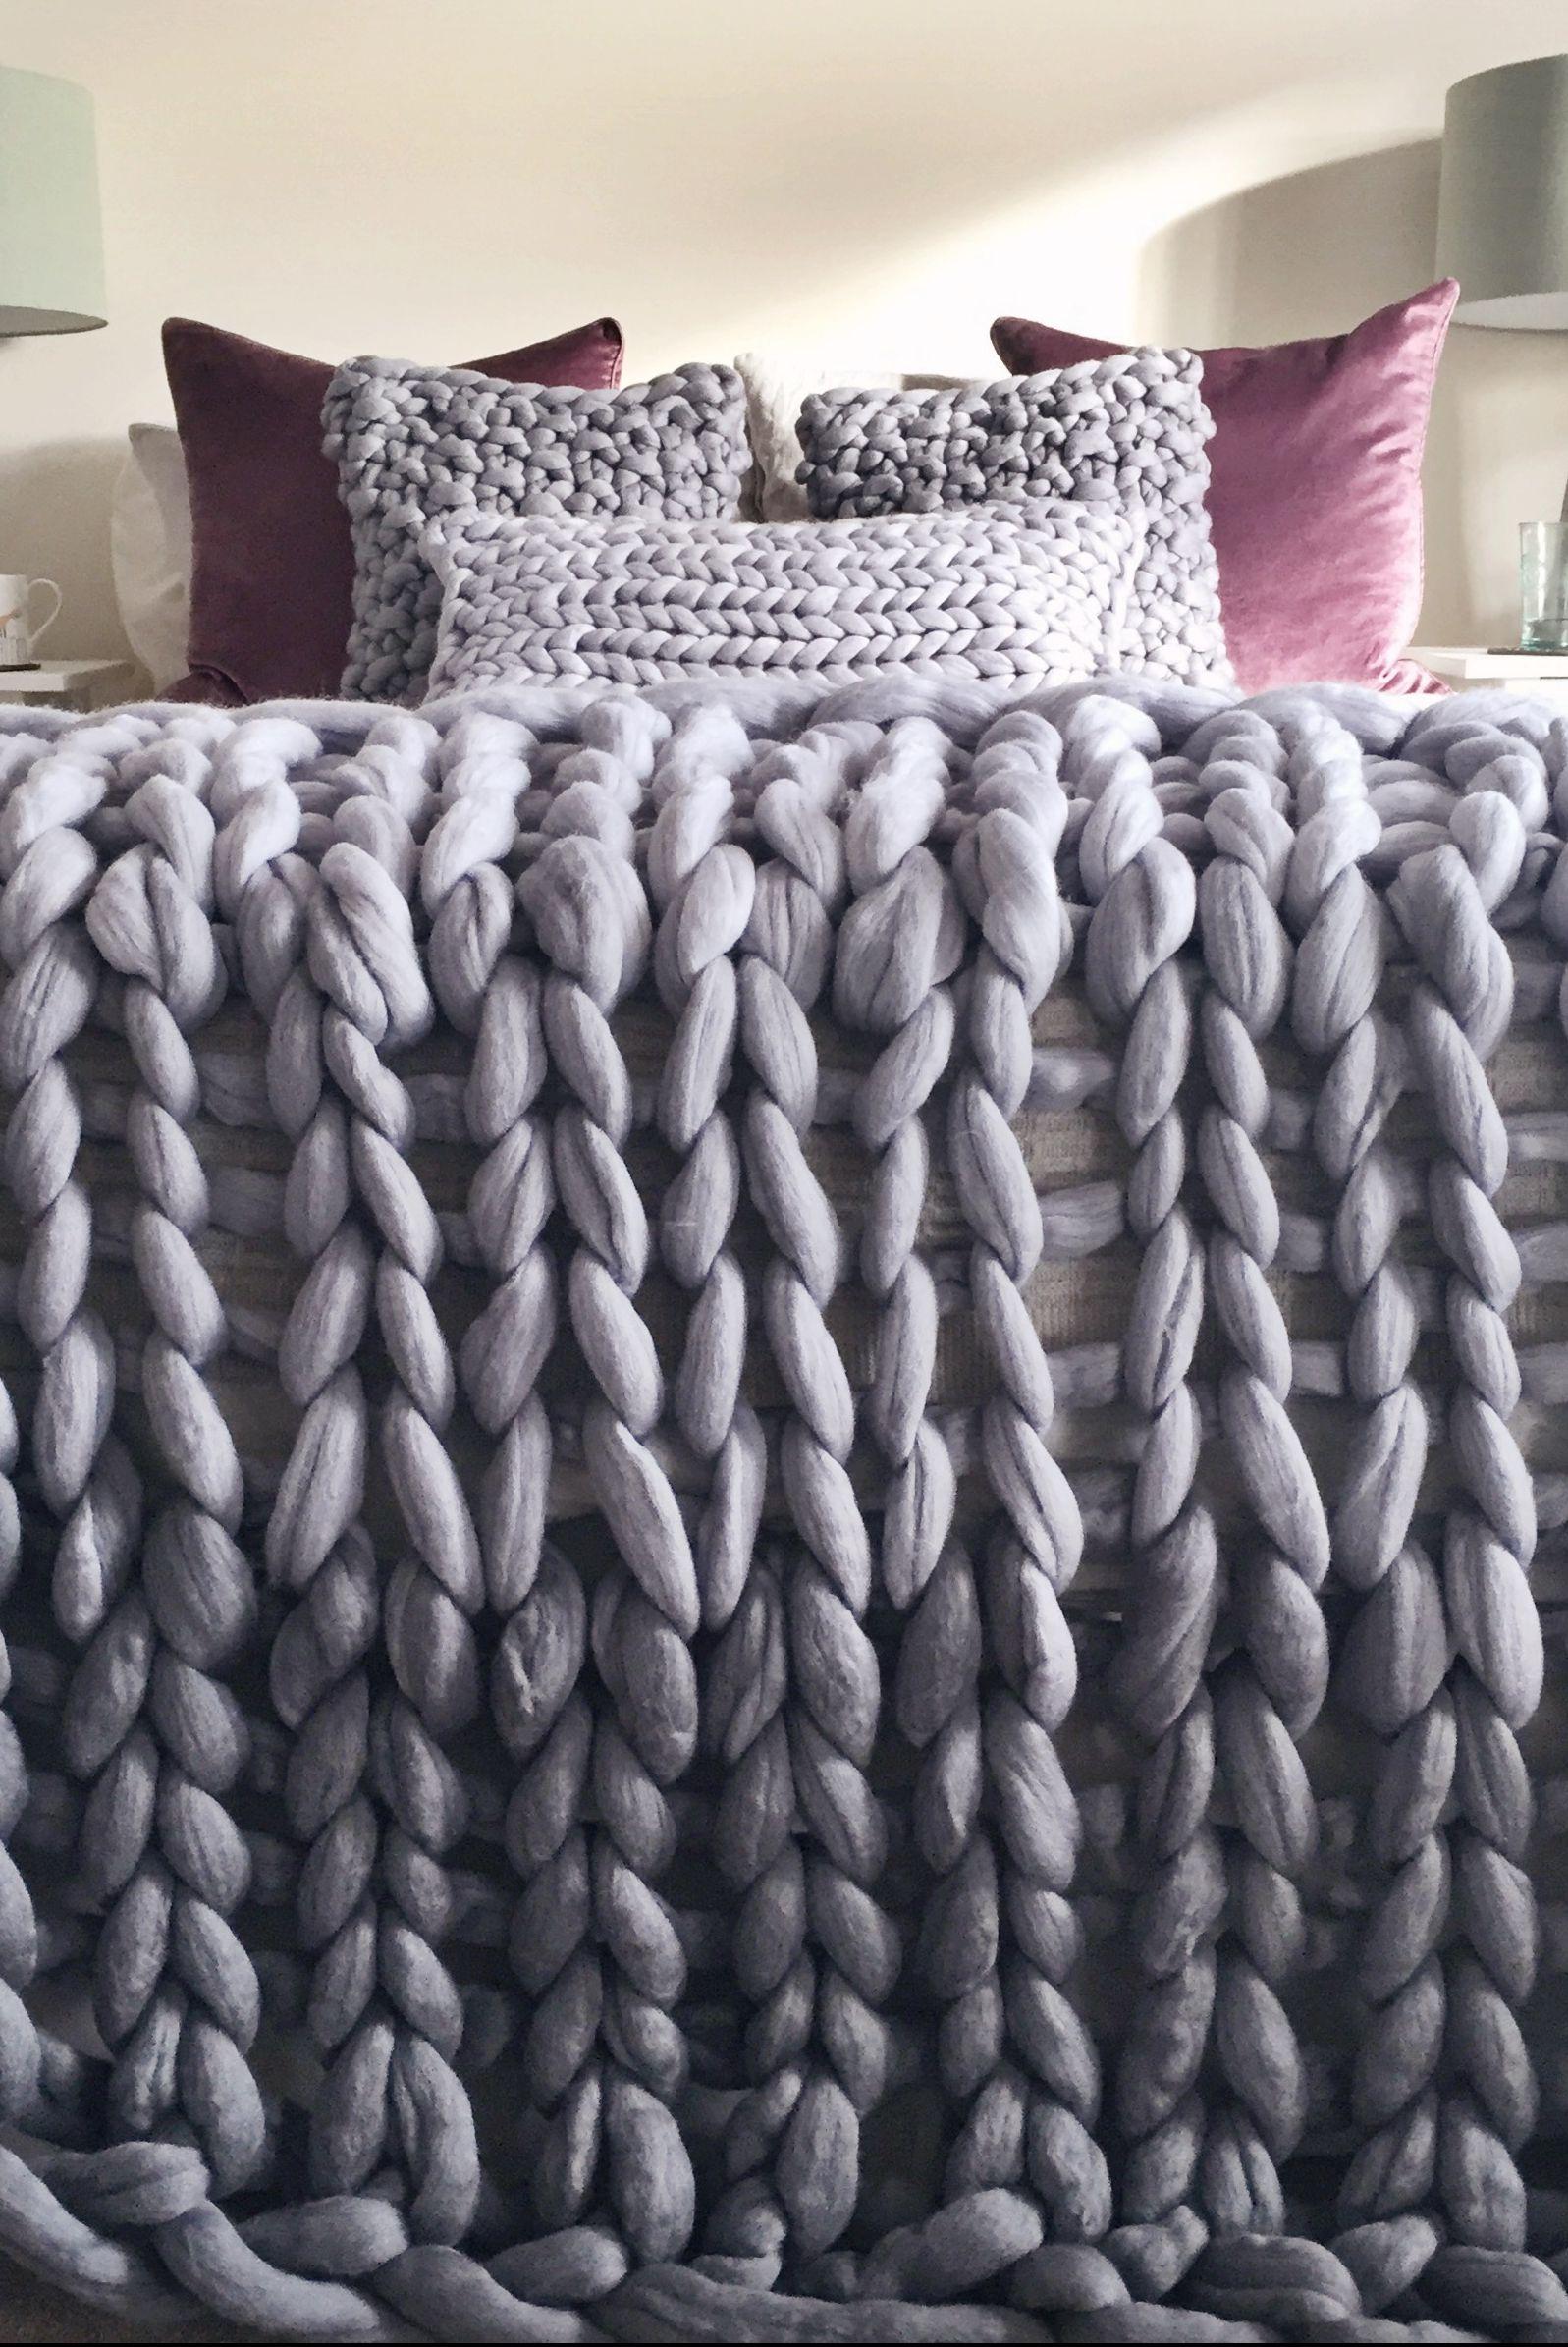 Giant Knit Ombre Blanket by Lauren Aston Designs,Giant Knit Ombre Blanket